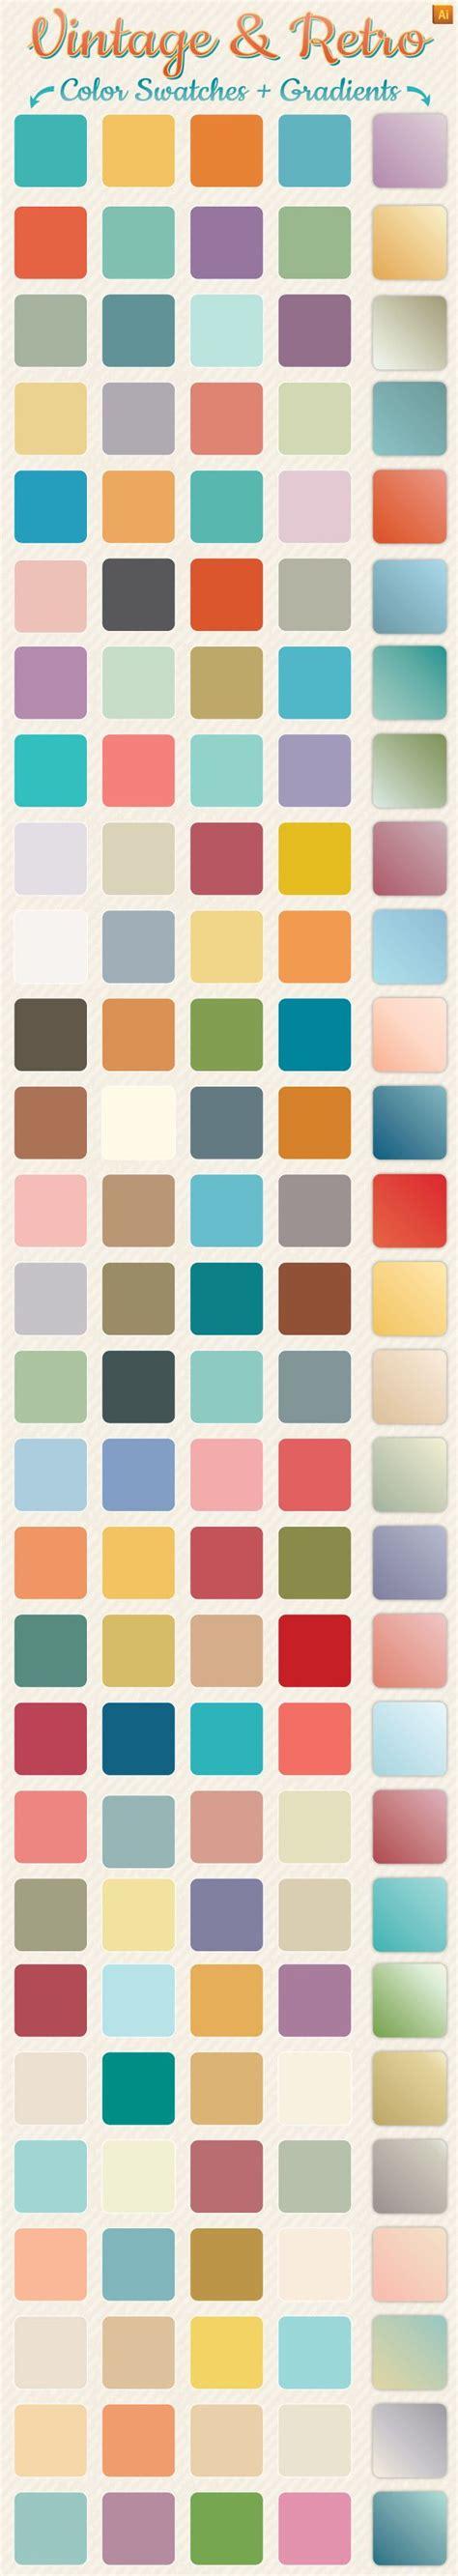 adobe illustrator change pattern color vintage retro gradients color swatches vintage